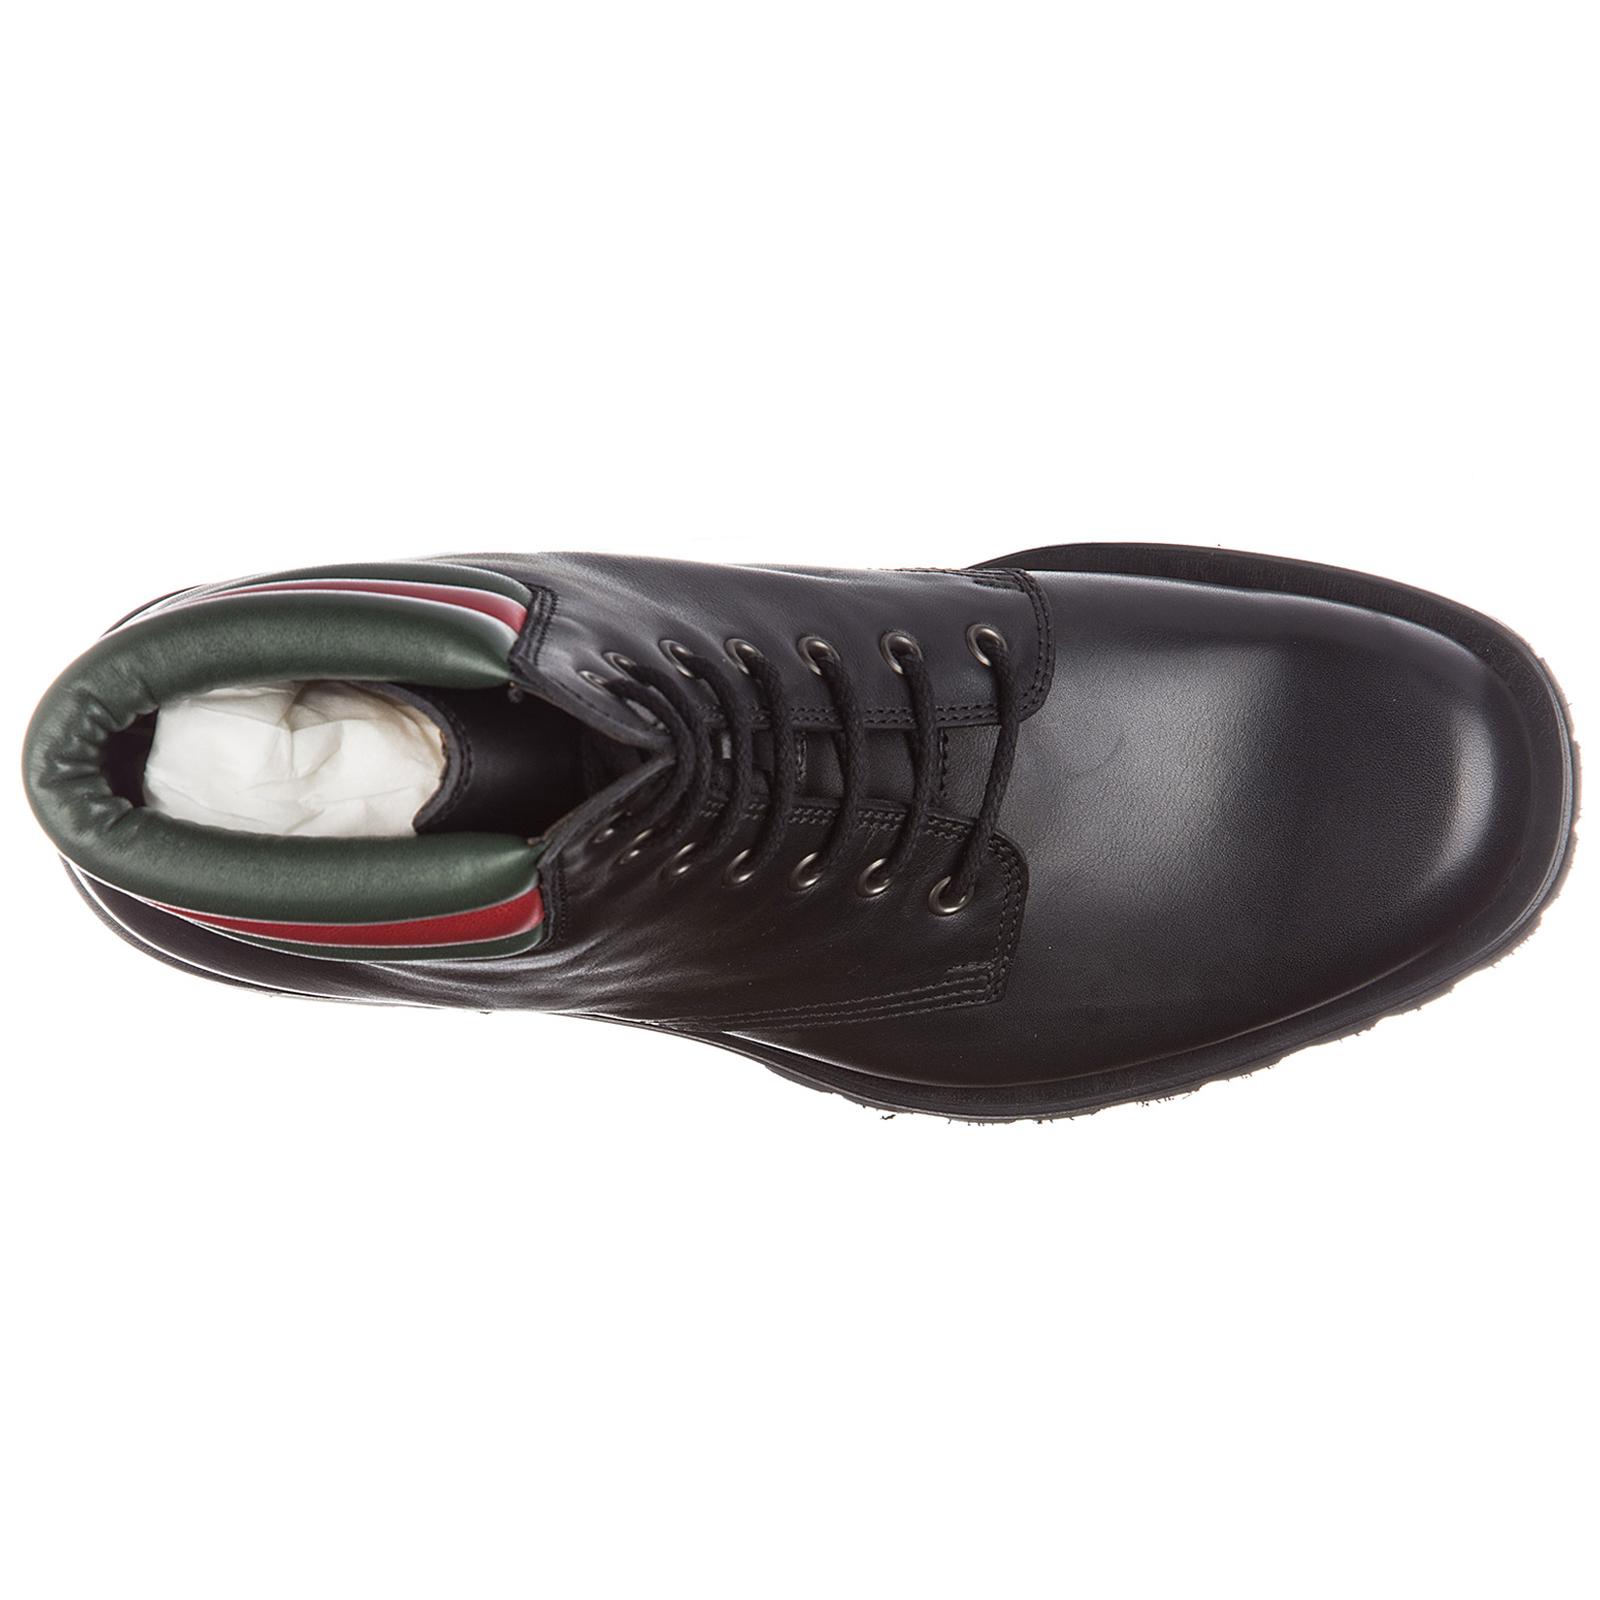 Leder stiefeletten boots herren web pantoufle